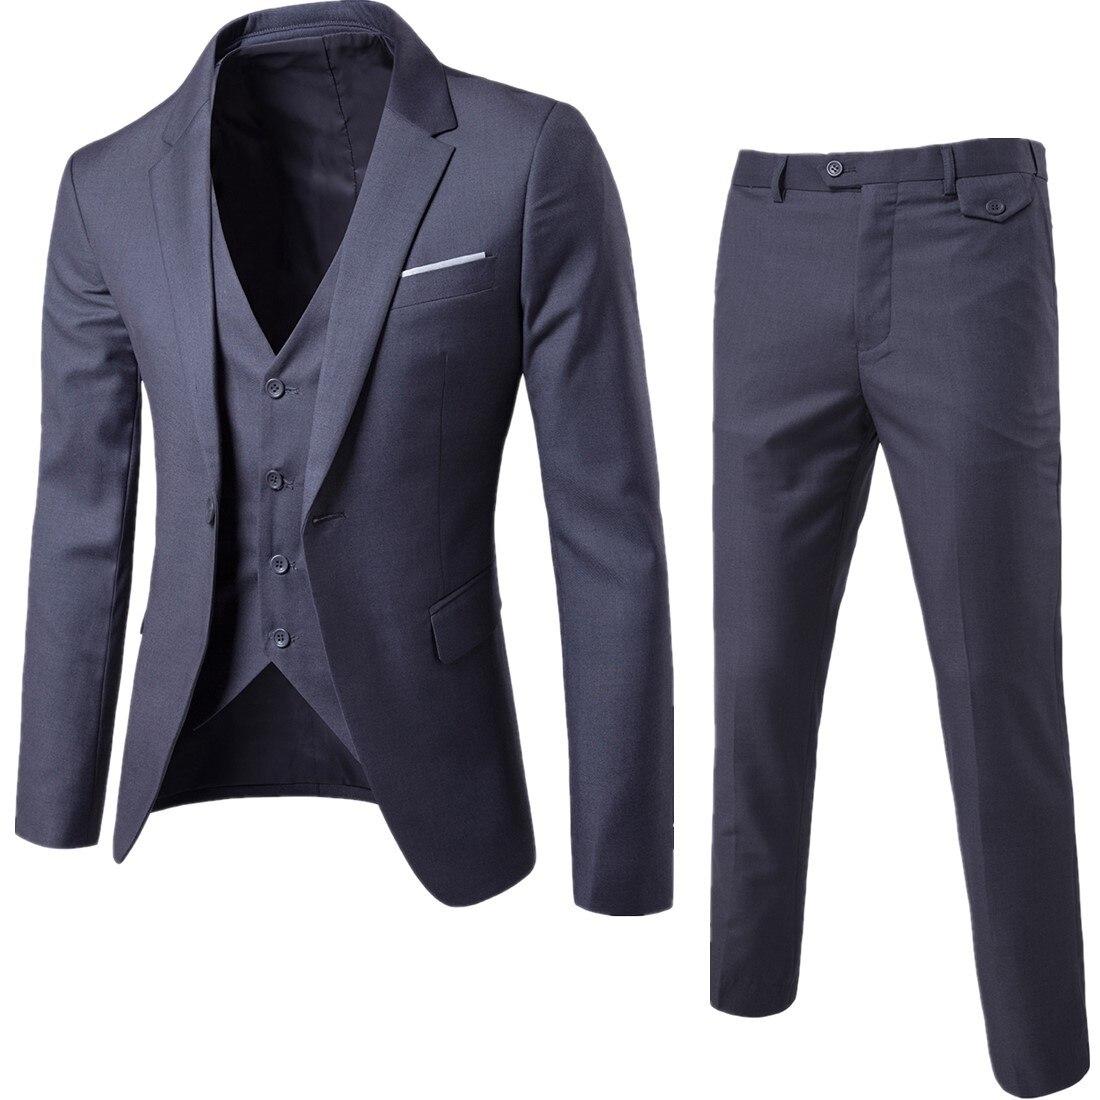 Suit Men Three-piece Set Business Formal Wear Business Suit Slim Fit Best Man Groom Marriage Ceremony